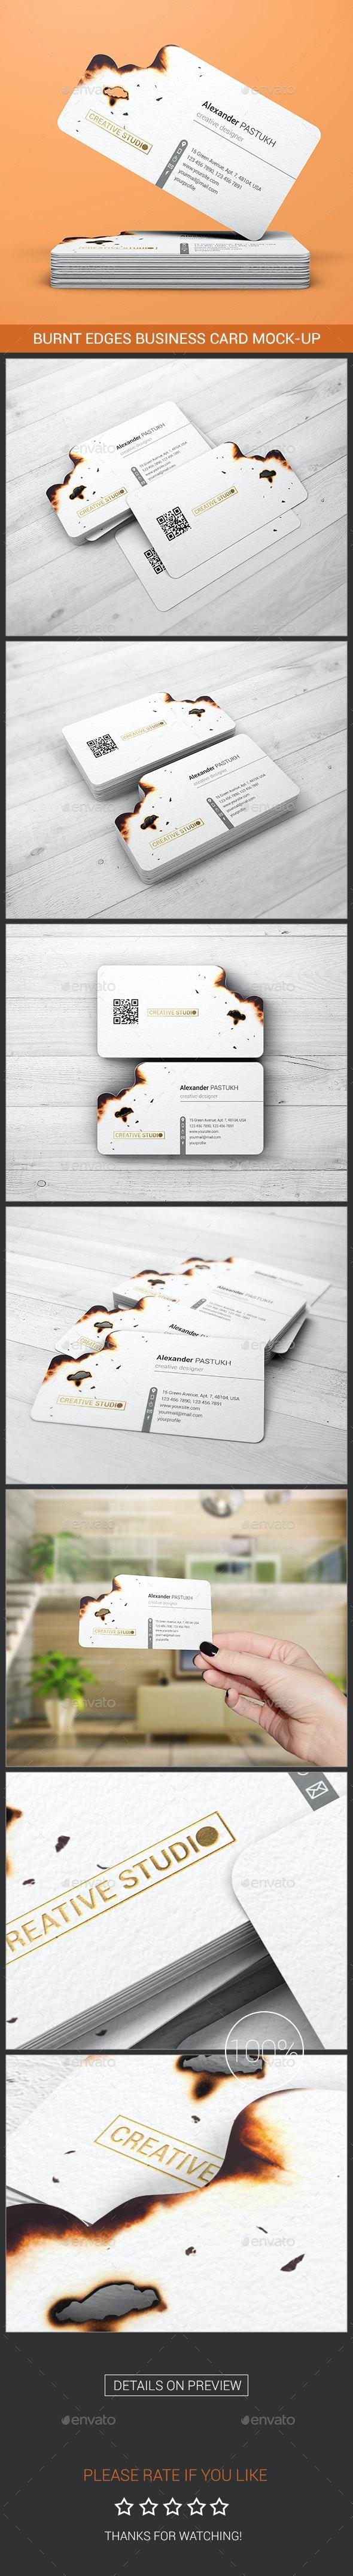 Burnt Edges Business Card Mock-Up - Business Cards Print